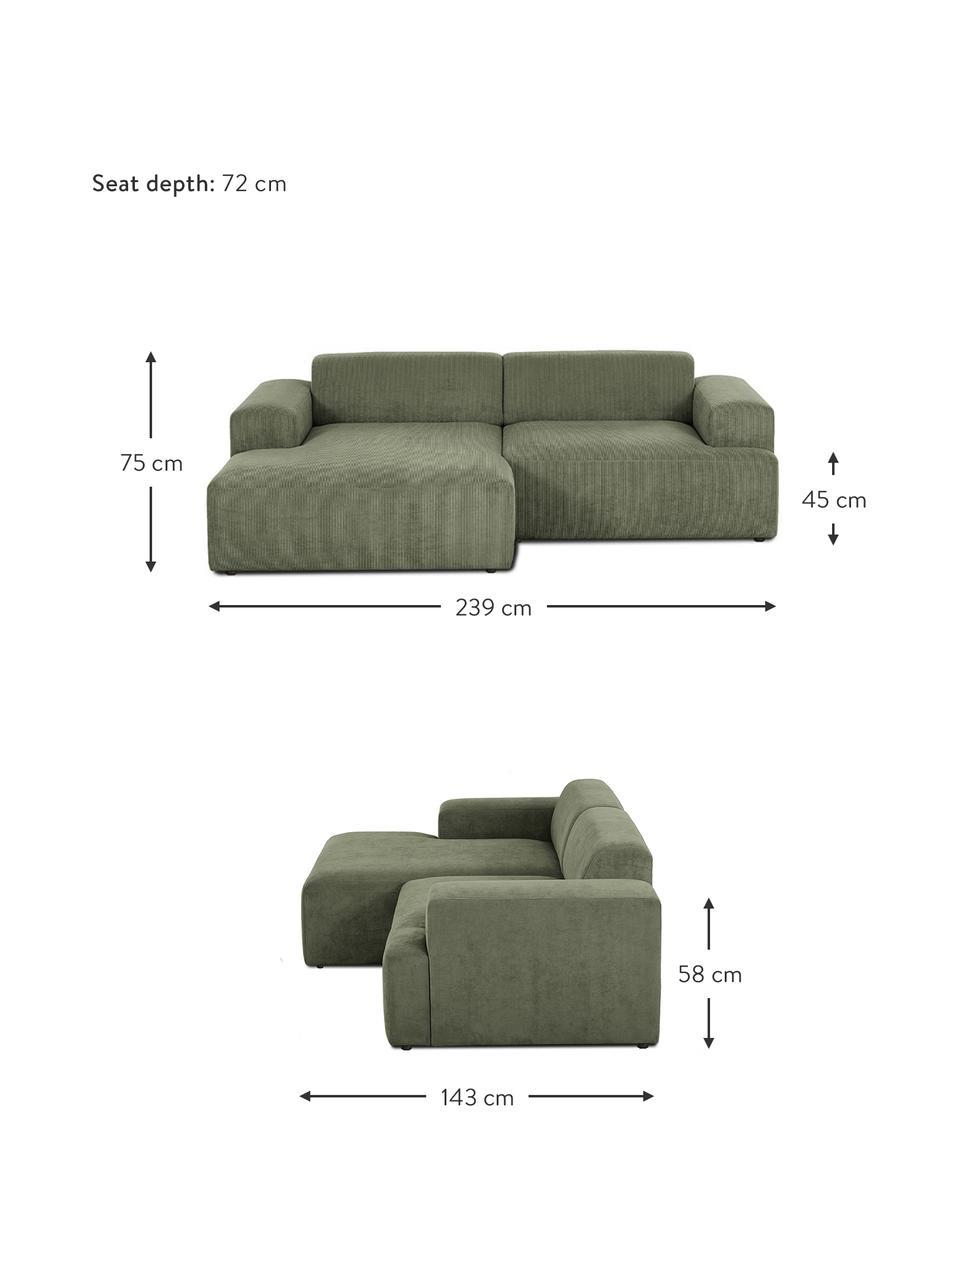 Cord-Ecksofa Melva (3-Sitzer) in Grün, Bezug: Cord (92% Polyester, 8% P, Gestell: Massives Kiefernholz, FSC, Füße: Kunststoff, Cord Grün, B 239 x T 143 cm